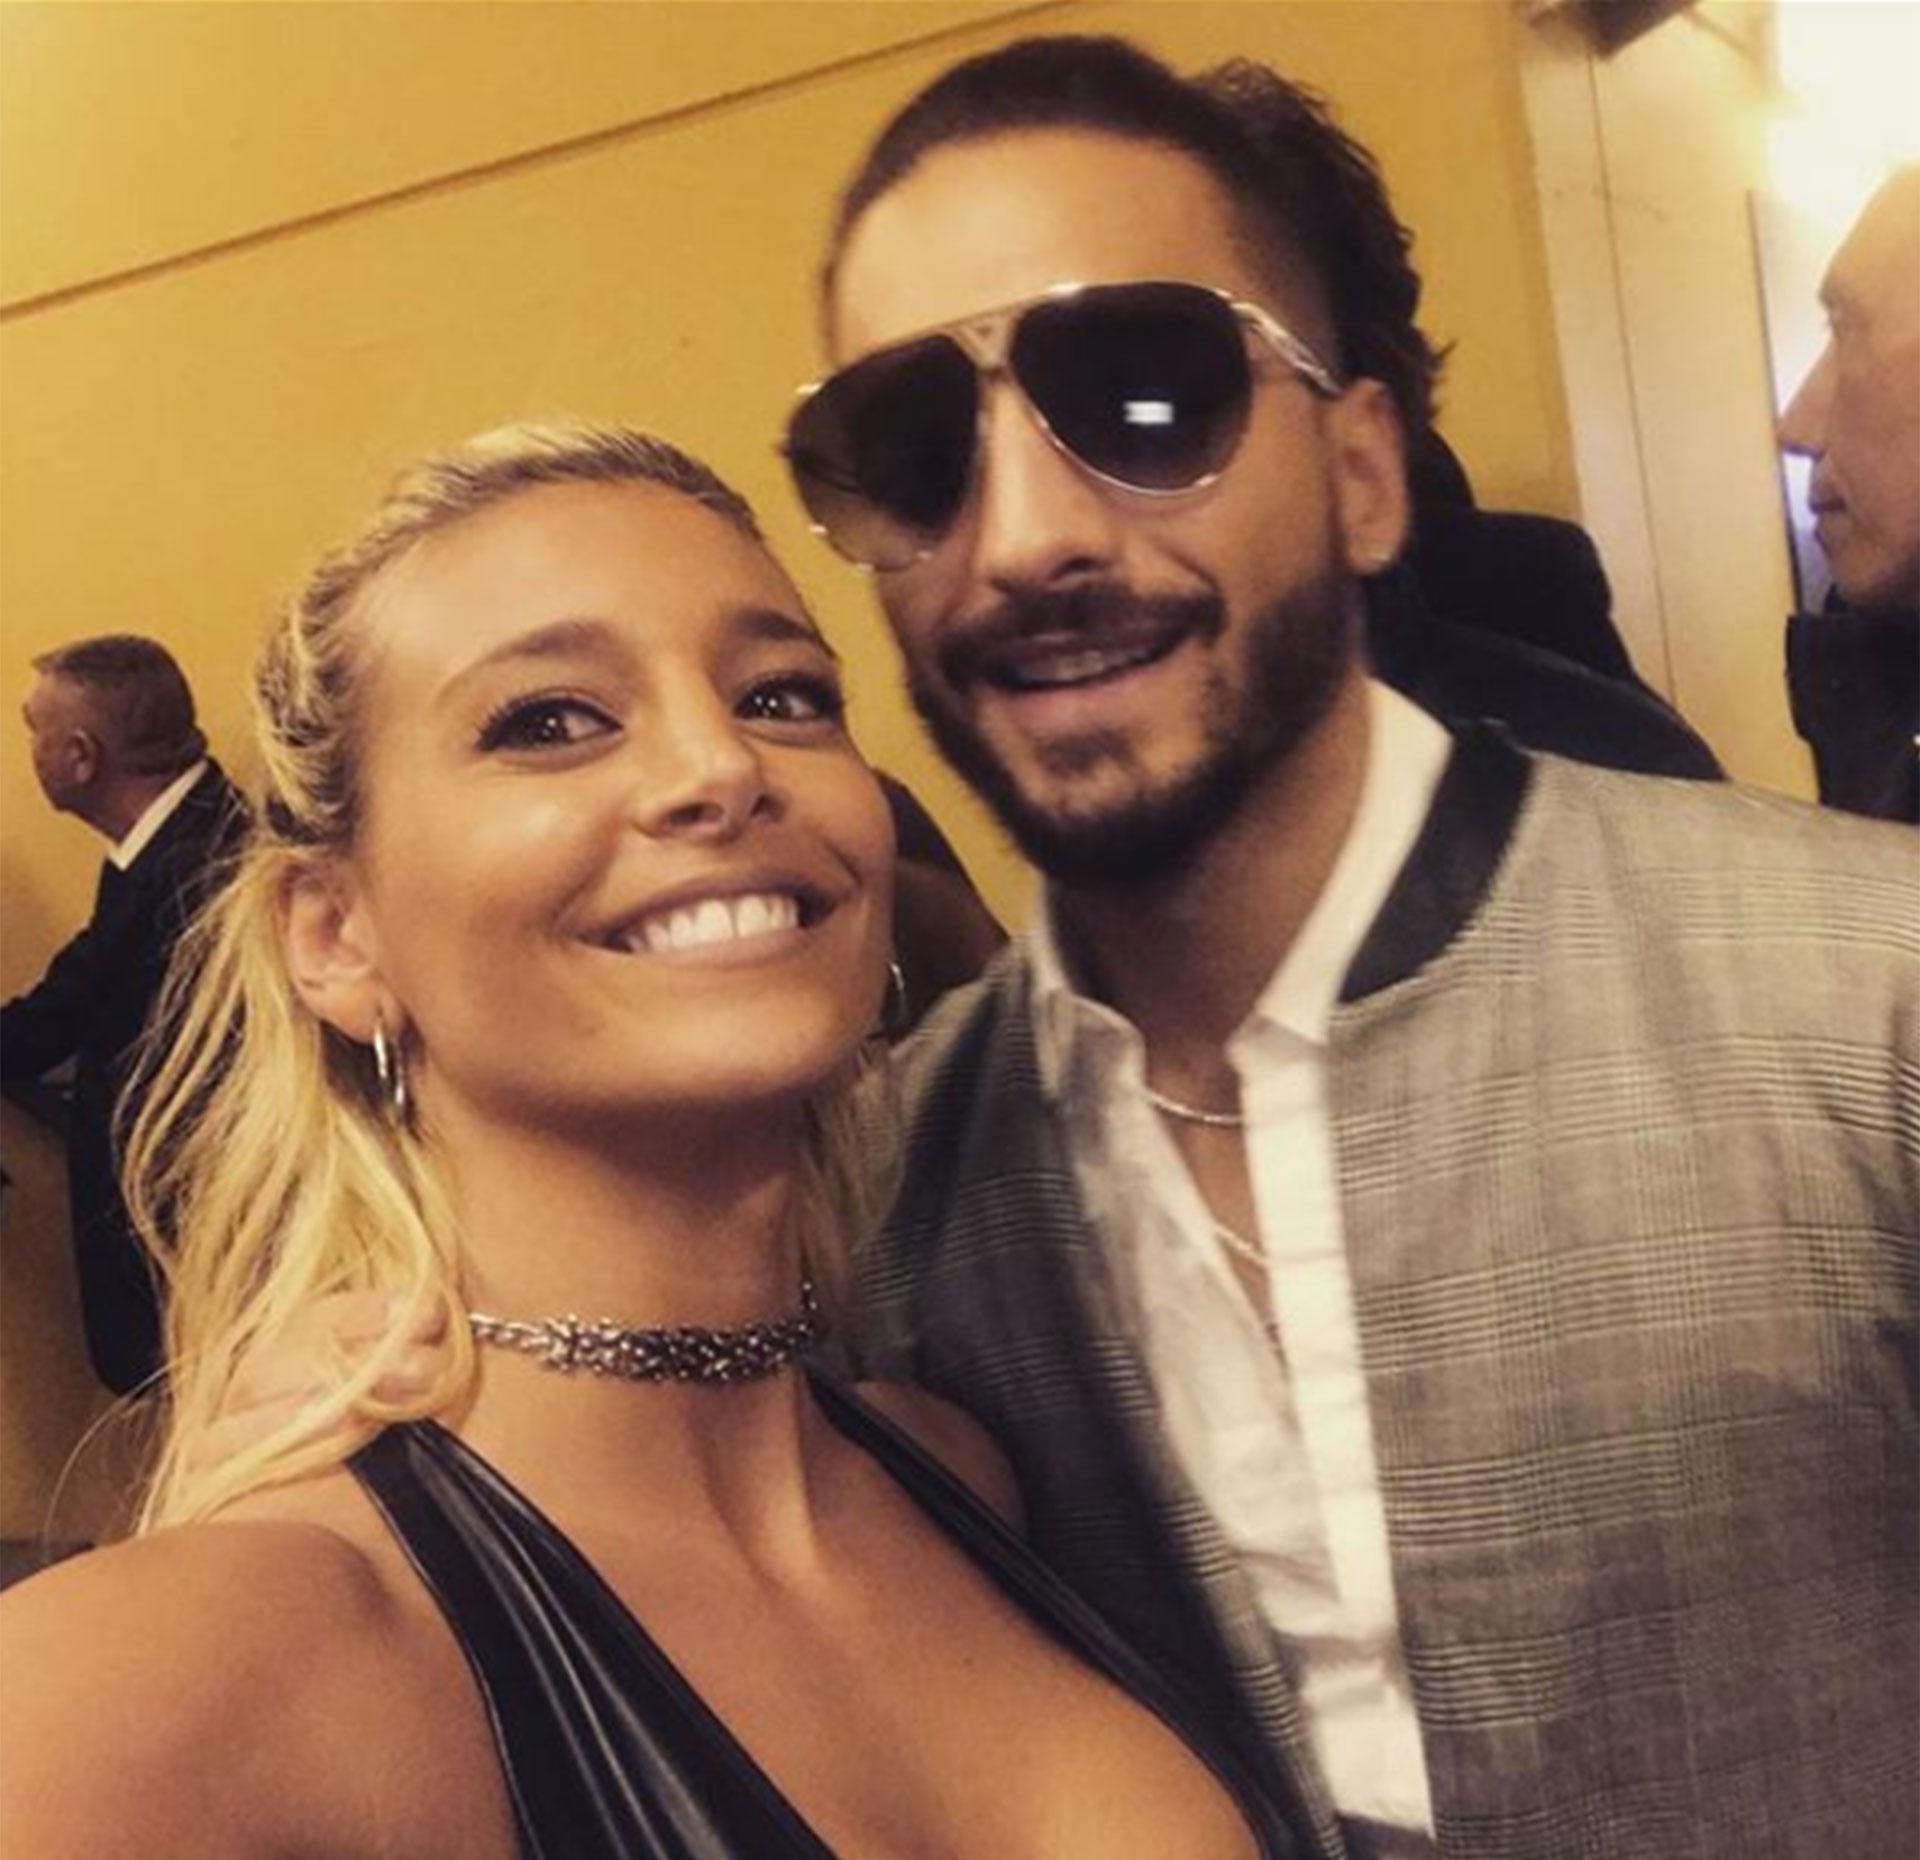 La selfie que le gustó al cantante